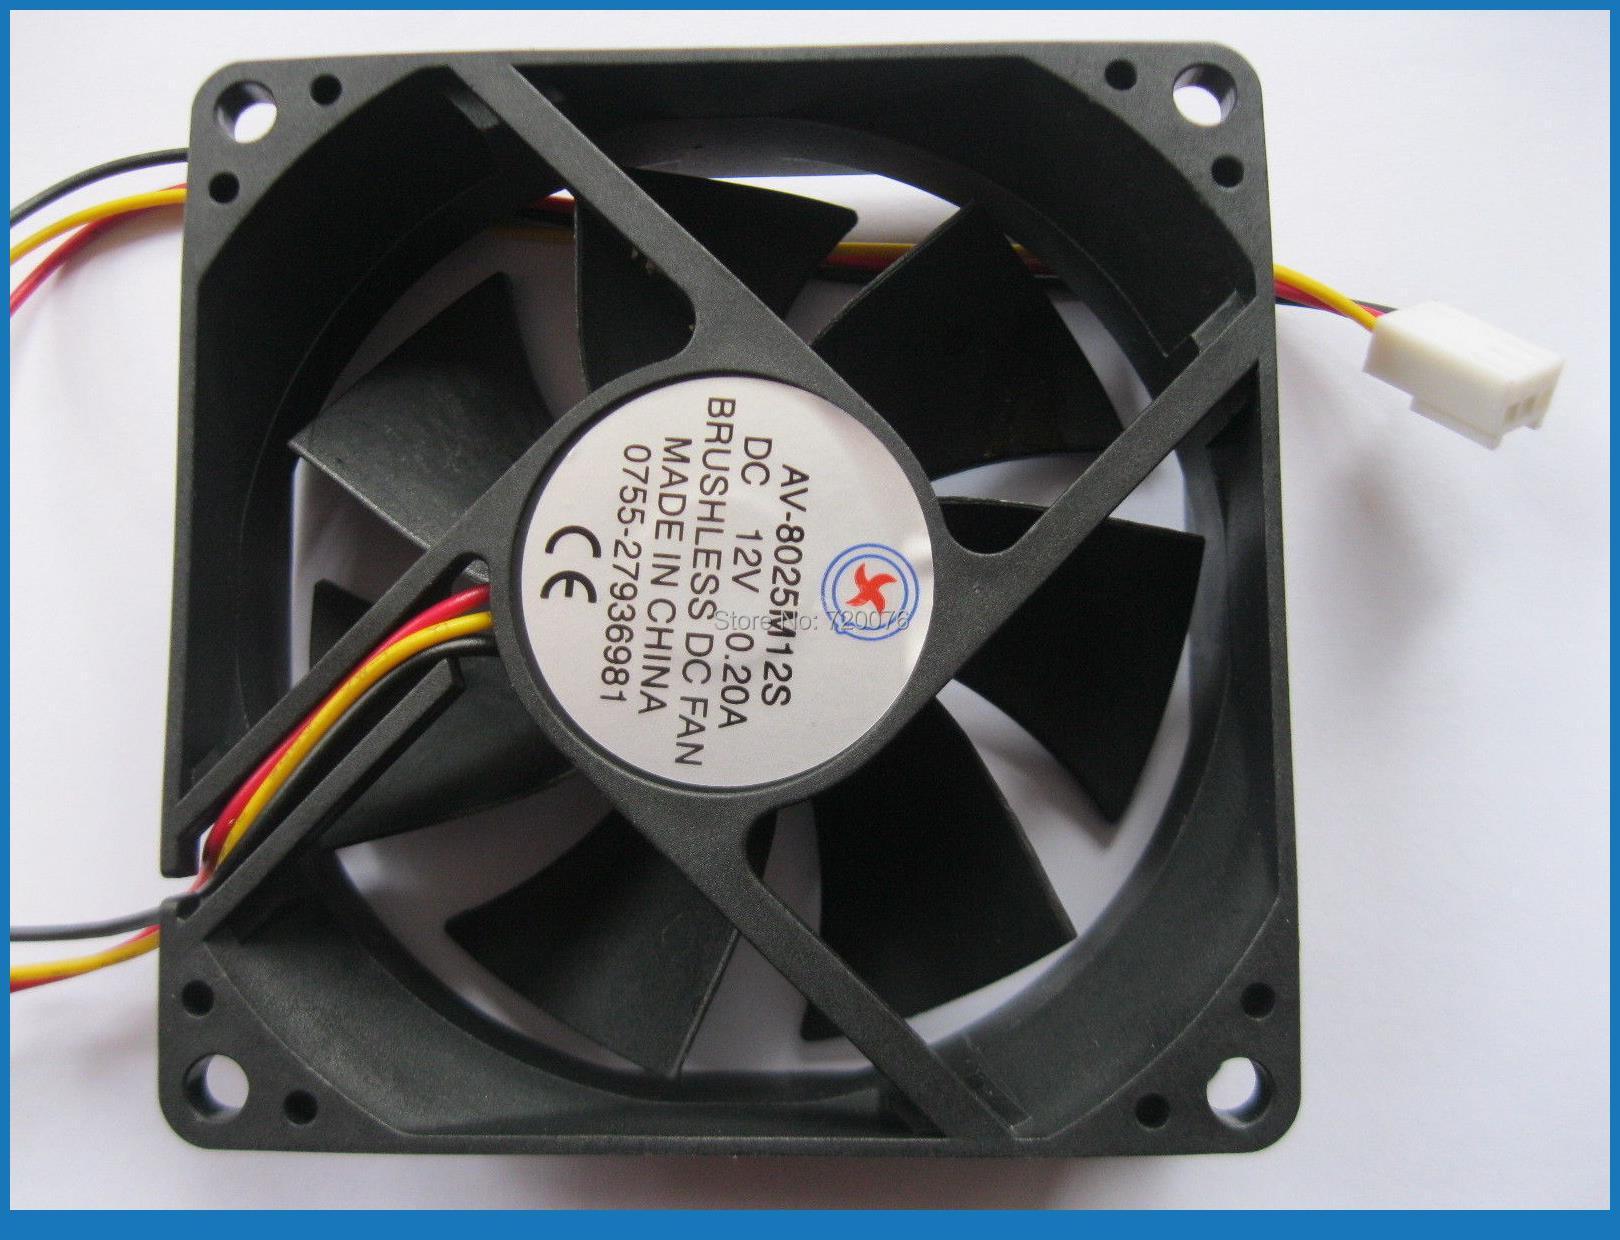 30 pcs Brushless DC Cooling 7 Blade Fan 8025S 12V 80x80x25mm 3 Wires 5010s dc 12v 0 1a brushless cooling fan 4 2cm diameter page 7